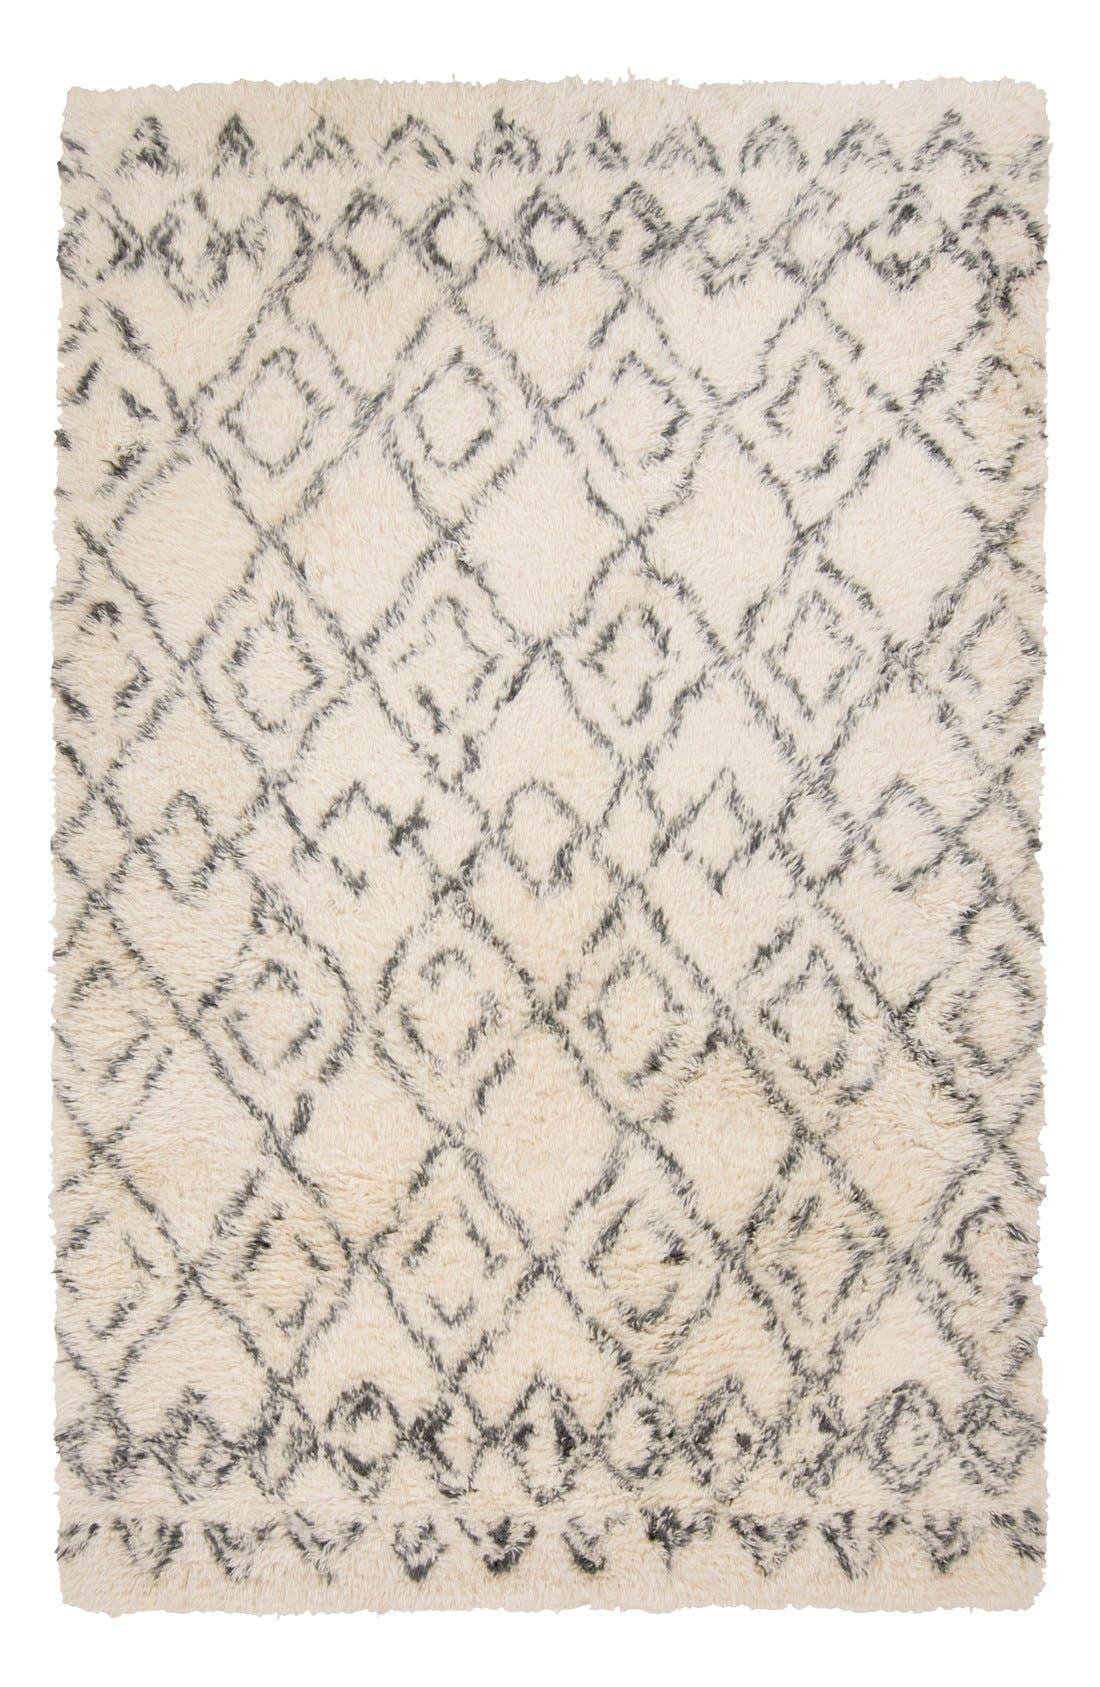 'Tasman' New Zealand Wool Rug,                         Main,                         color, IVORY/ CHARCOAL